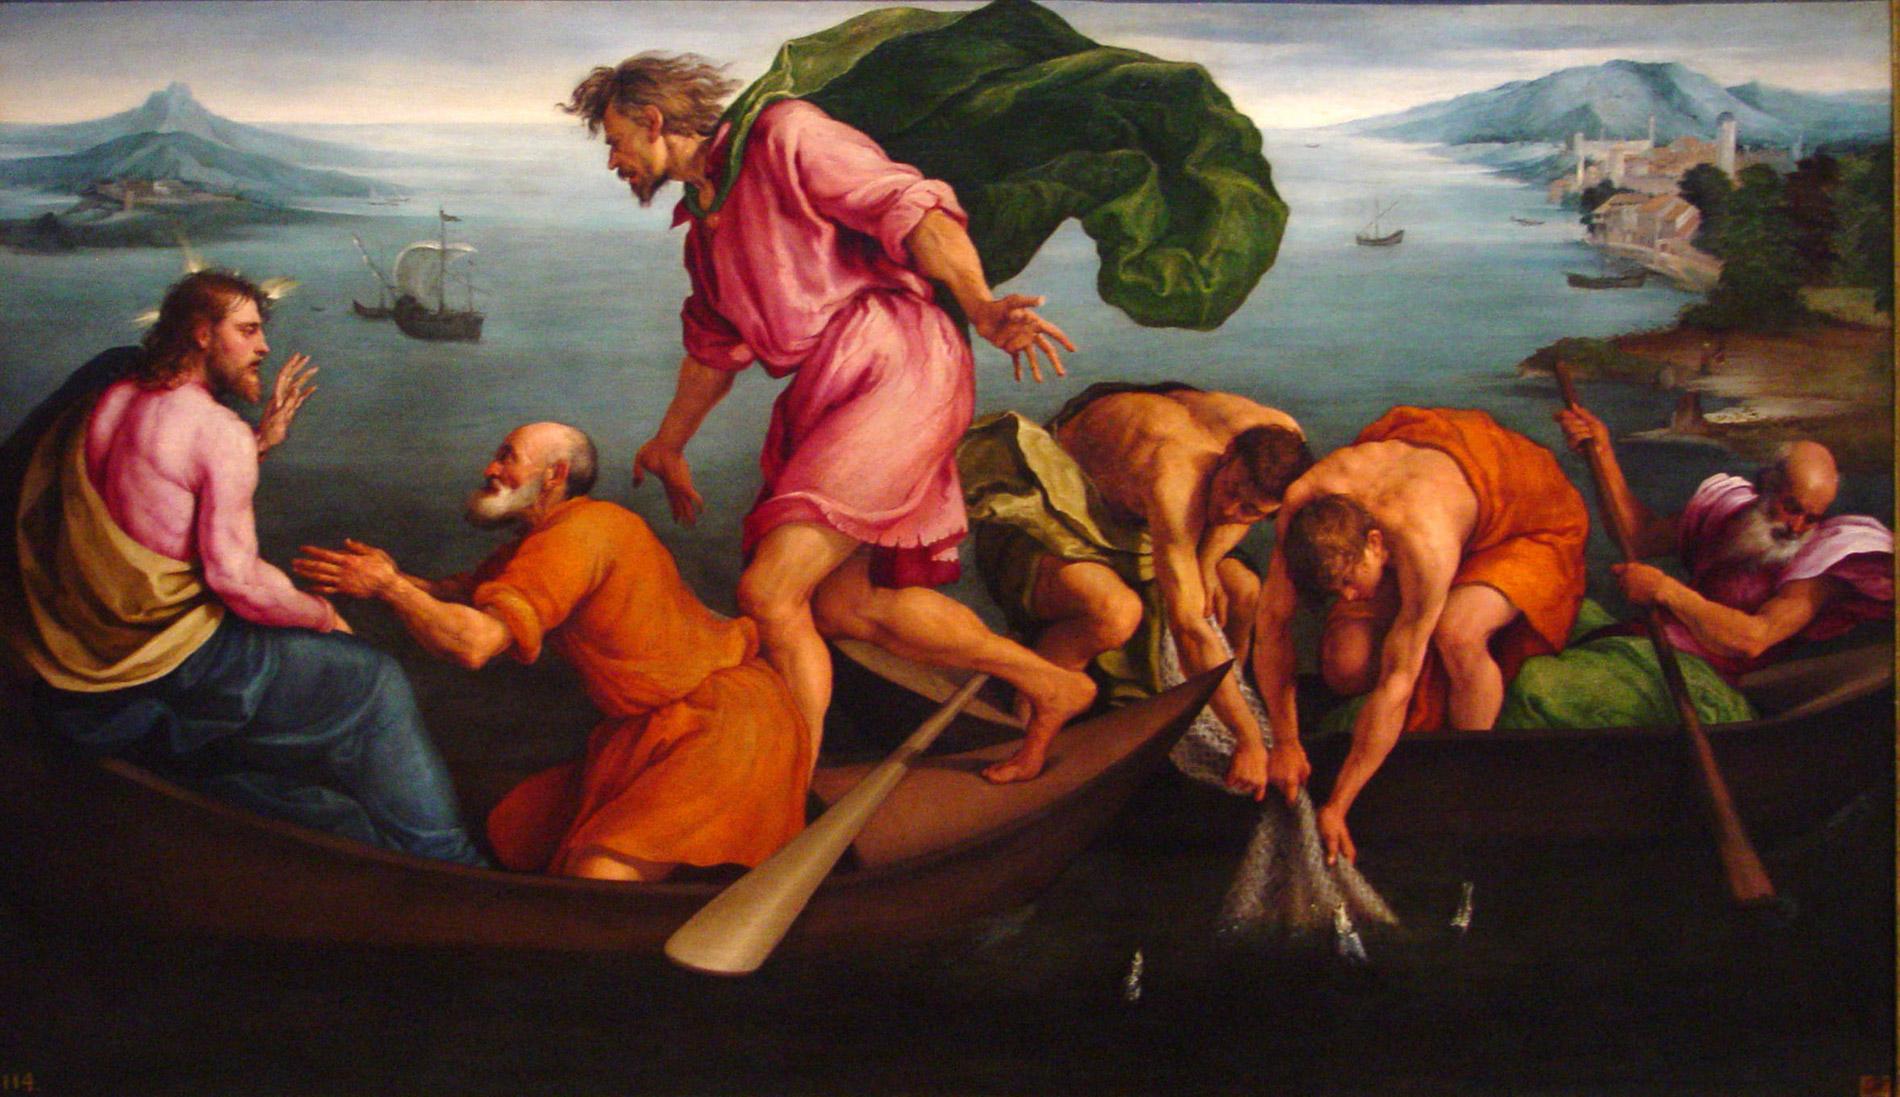 john chrysostom st. james sons of zebedee santiago de compostela feast July 25